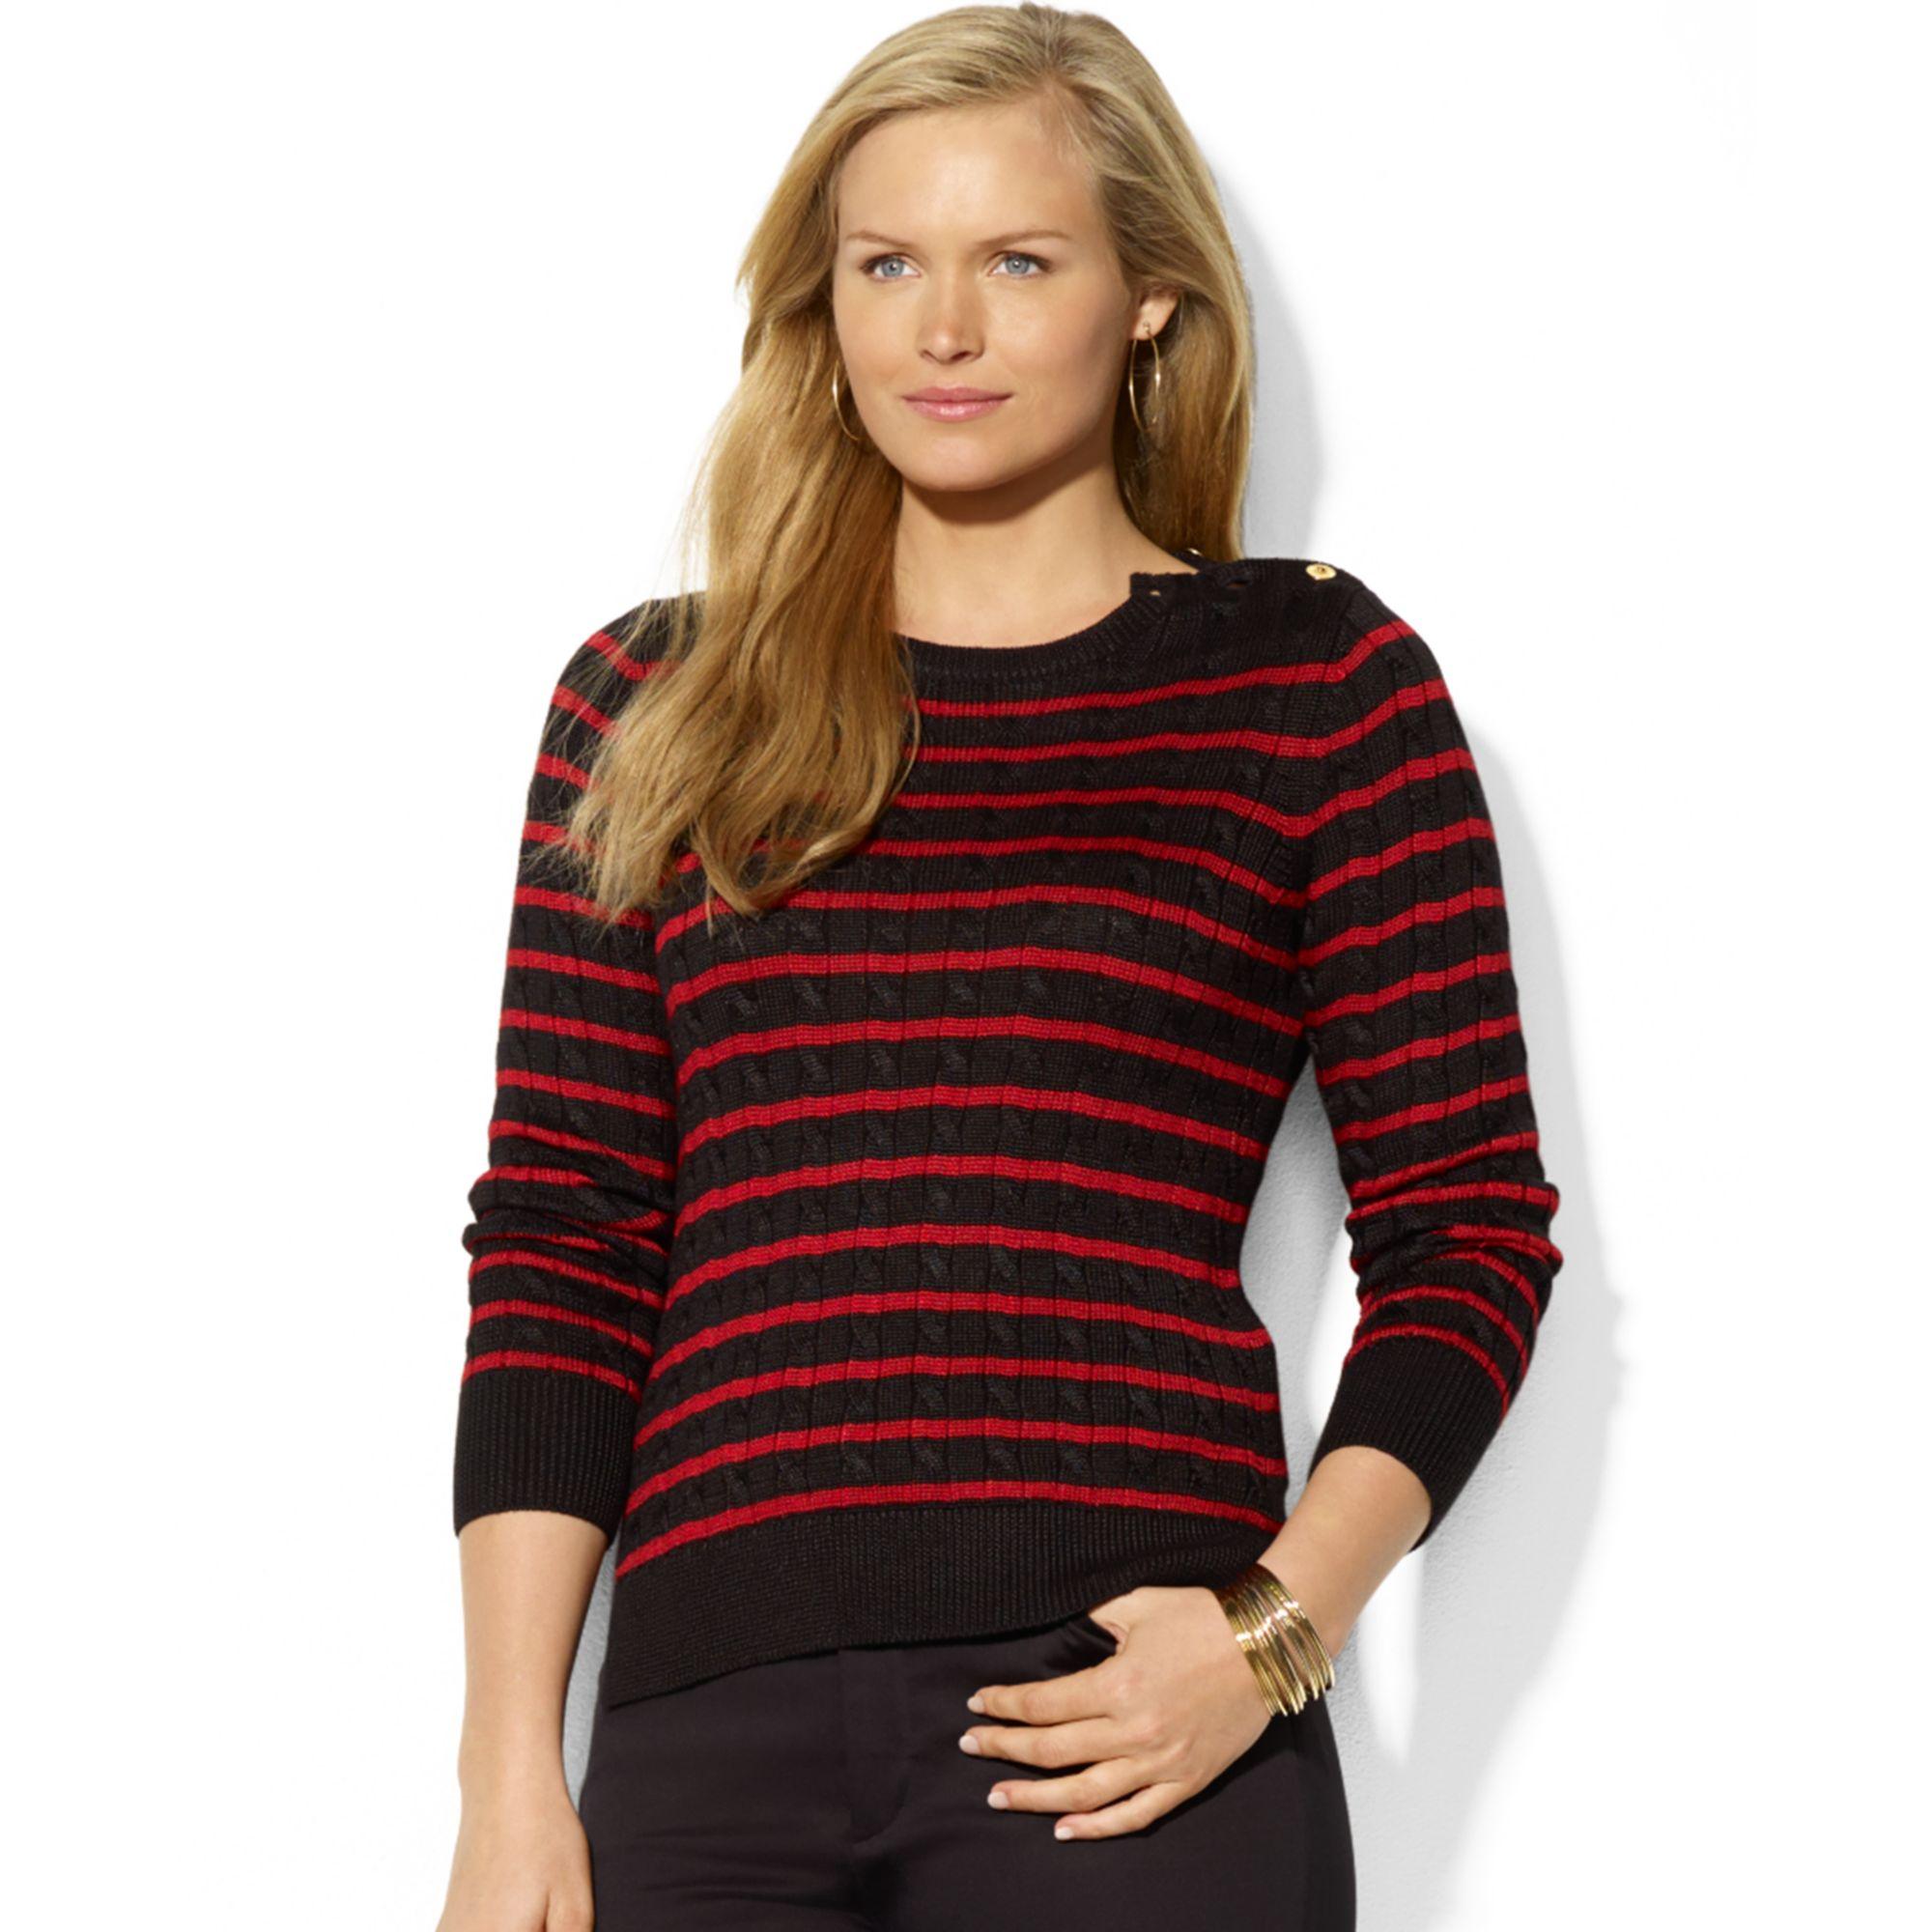 Cotton Cable Knit Sweater Plus Size